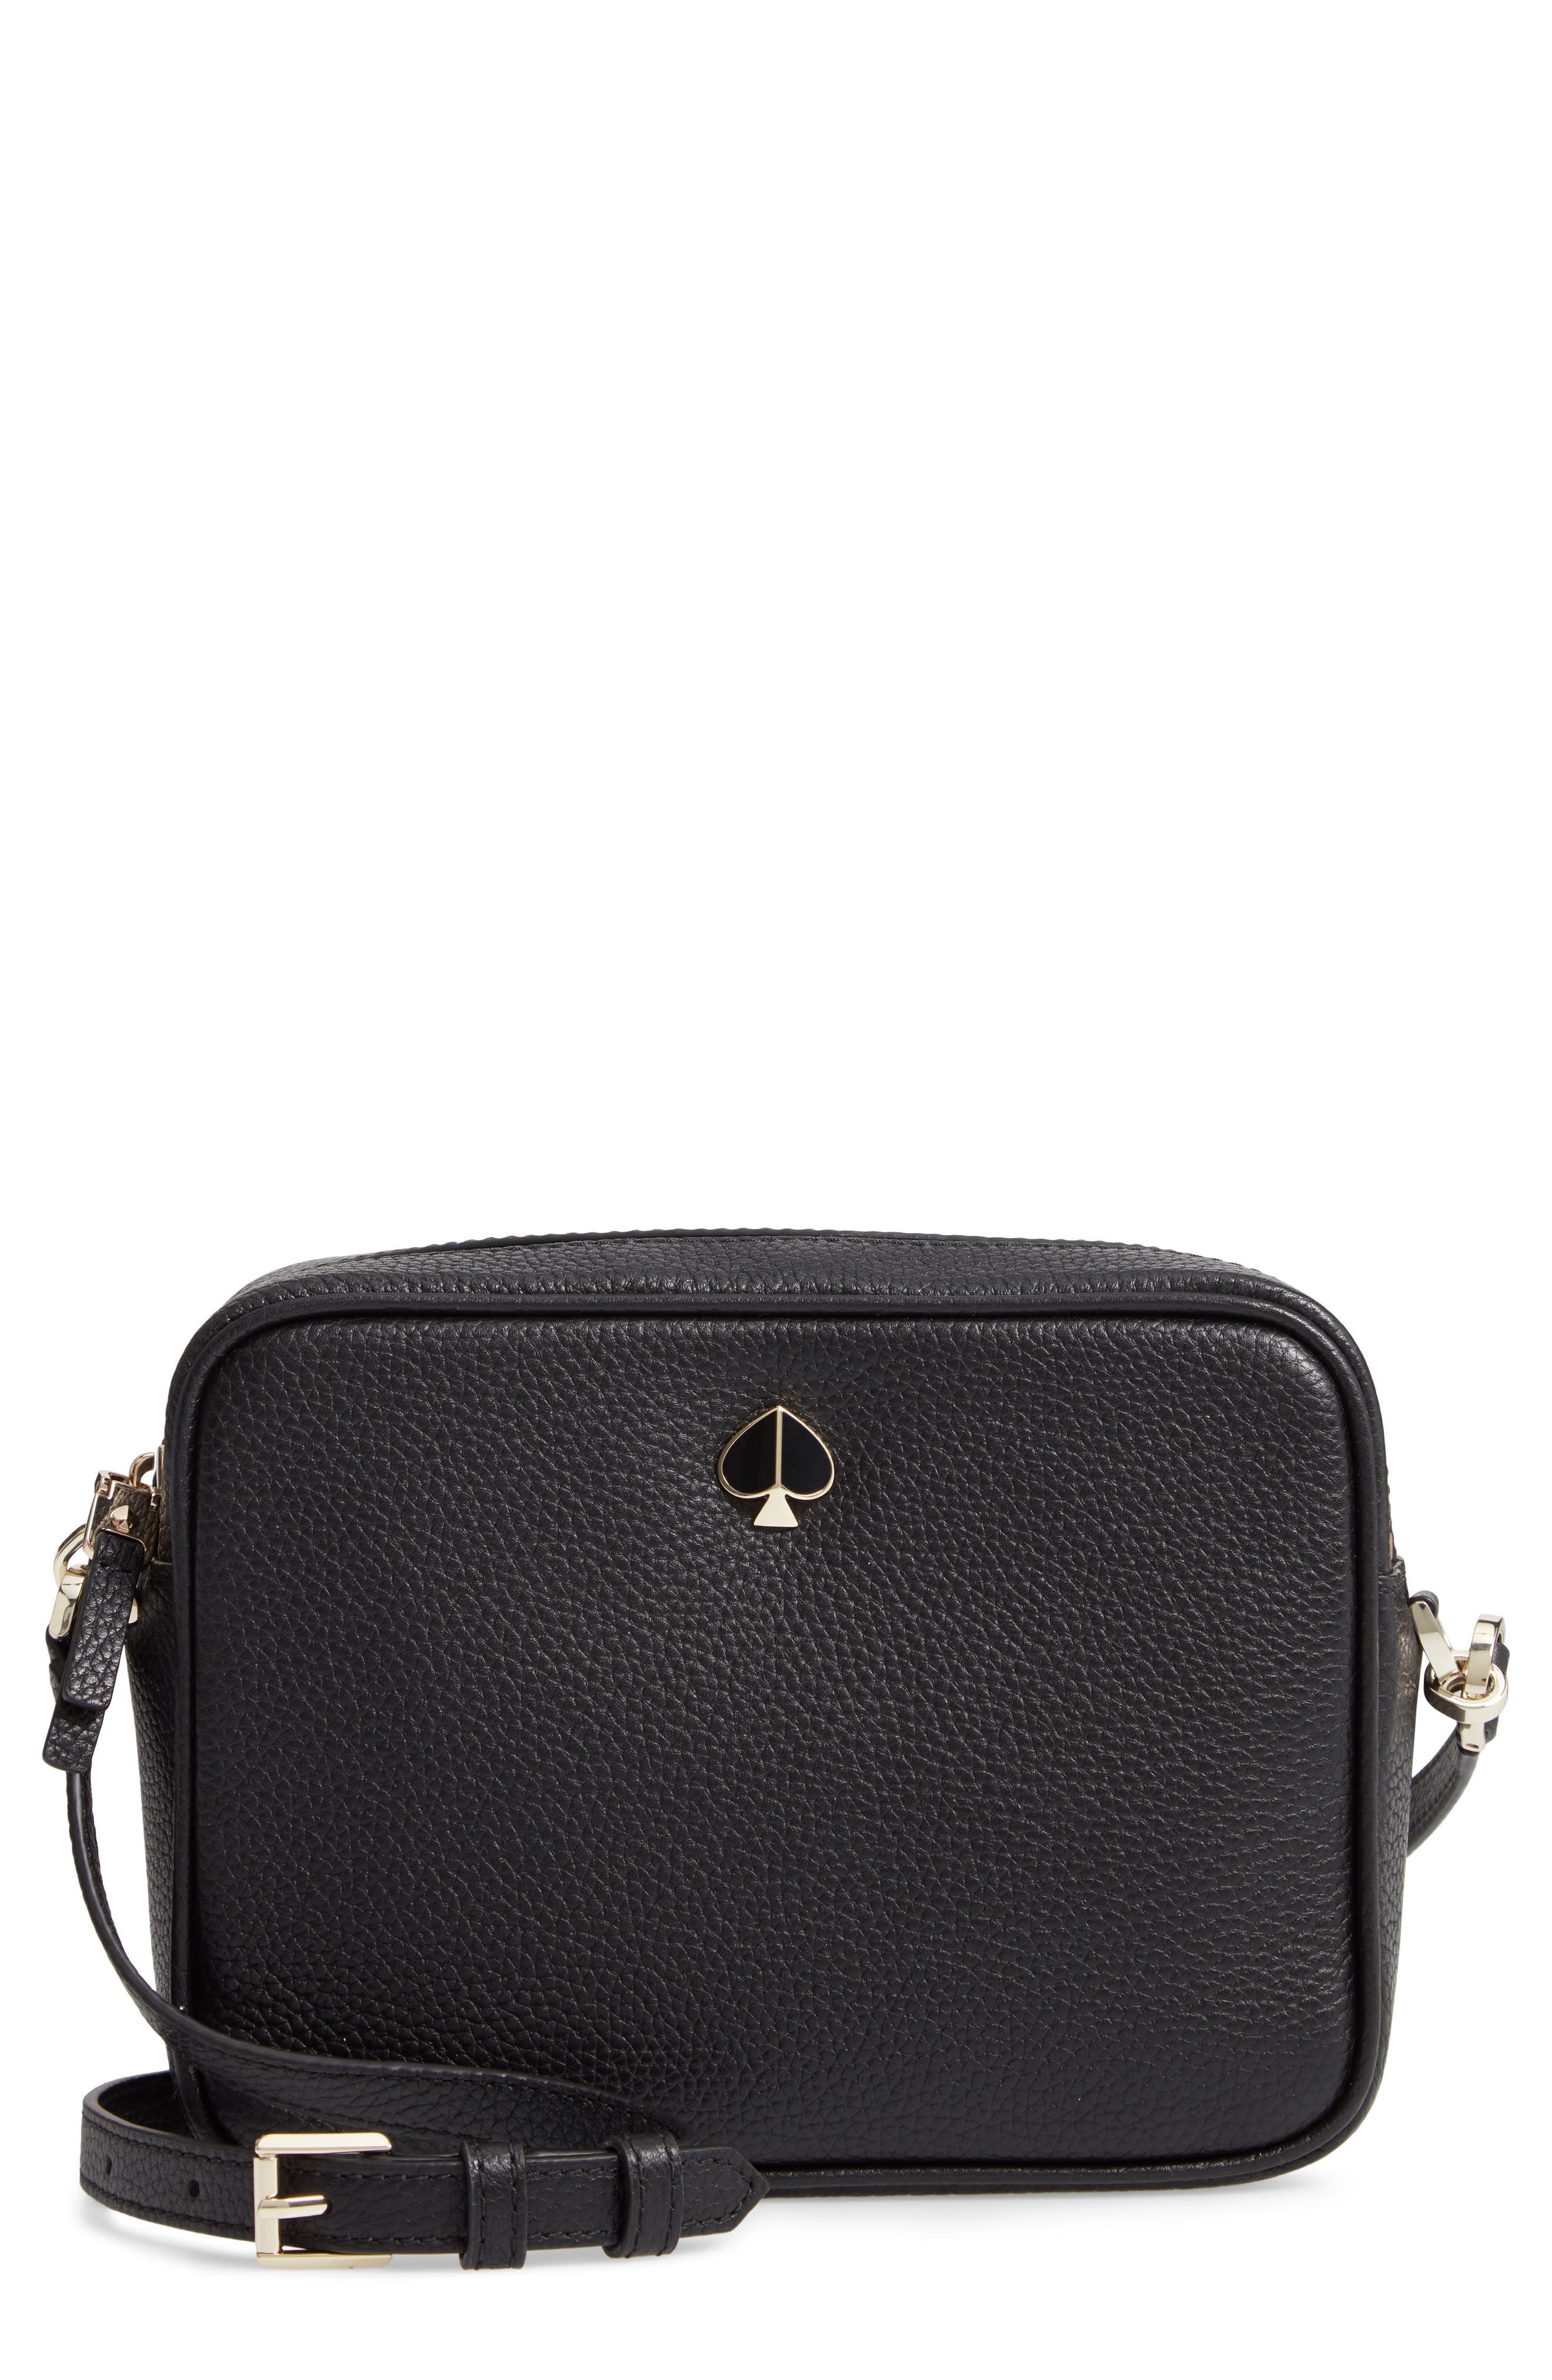 KATE SPADE NEW YORK, medium polly leather camera bag, Main thumbnail 1, color, BLACK